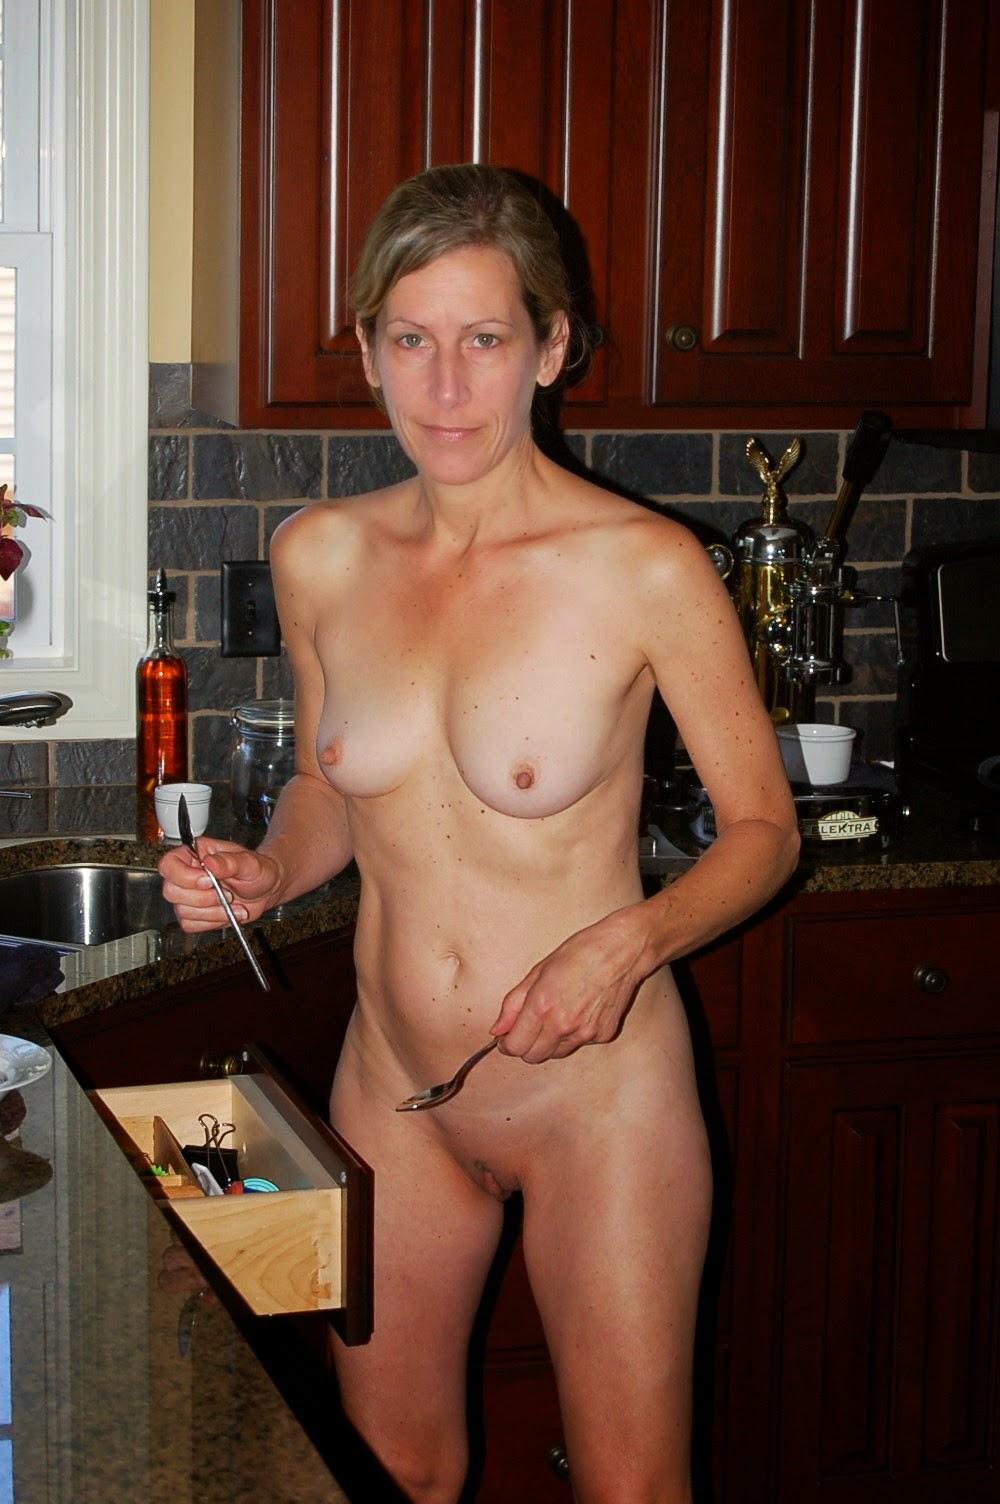 female exposure vids naked